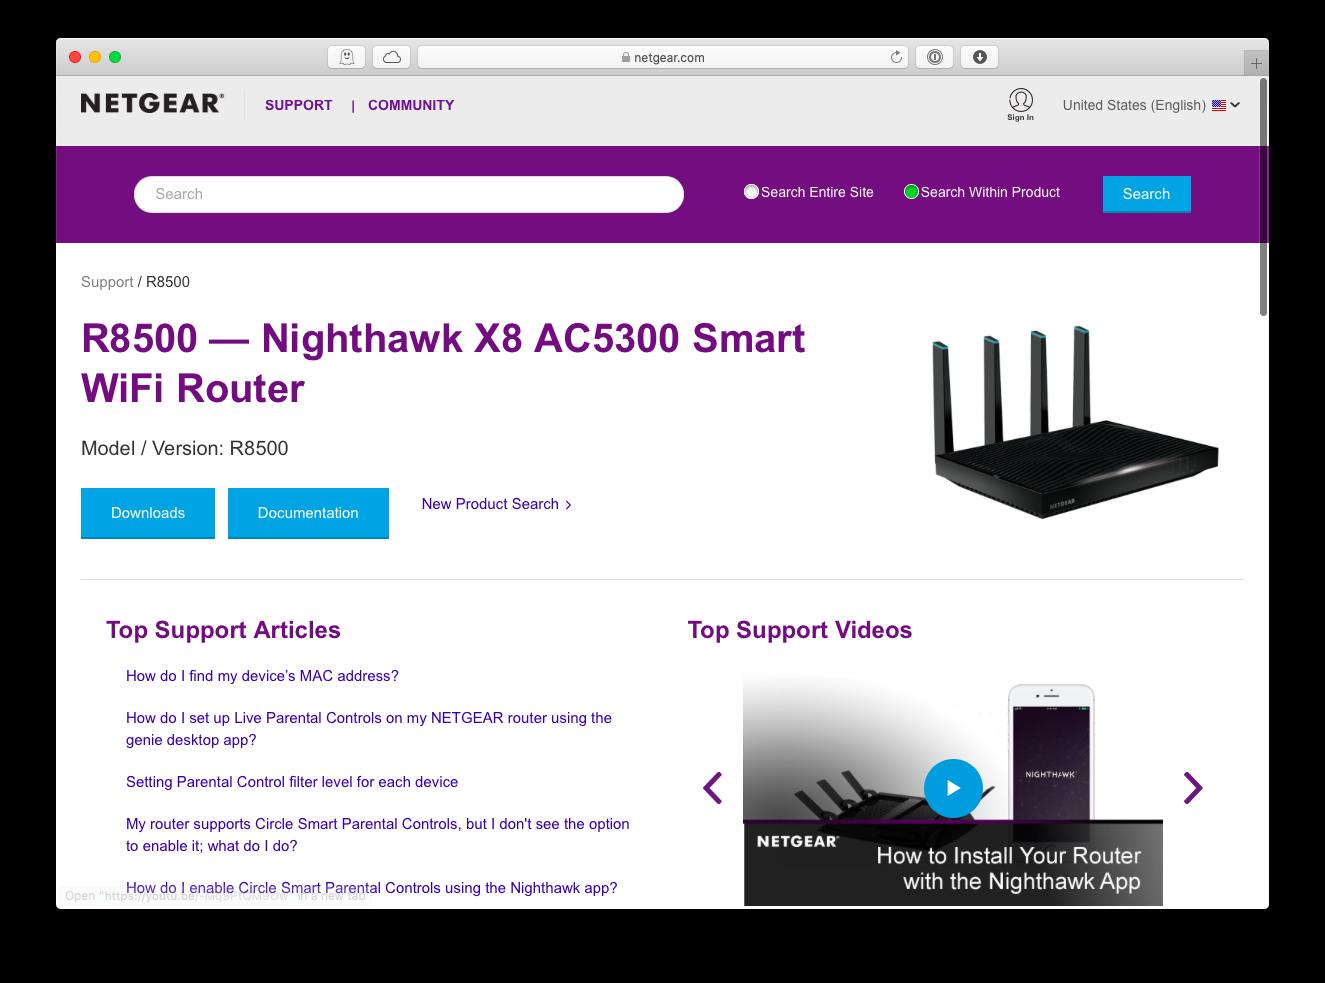 Netgear Nighthawk X8 AC5300 wifi router